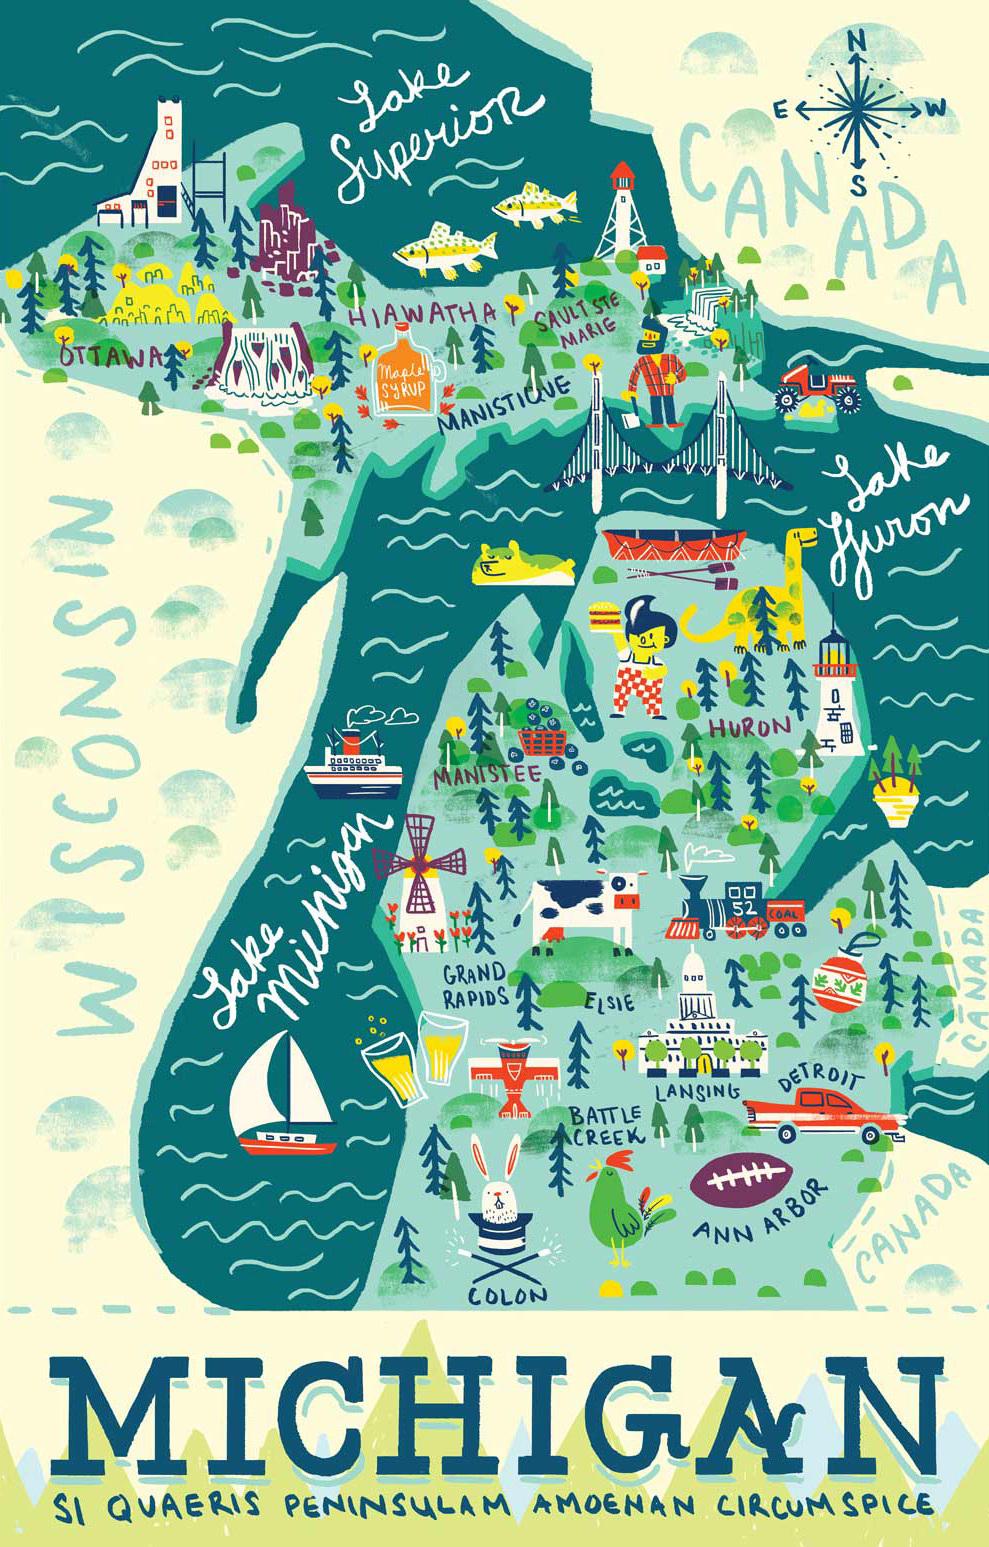 Campgrounds Around Michigan Its No Doubt That Michigan Has A - Michiganmap